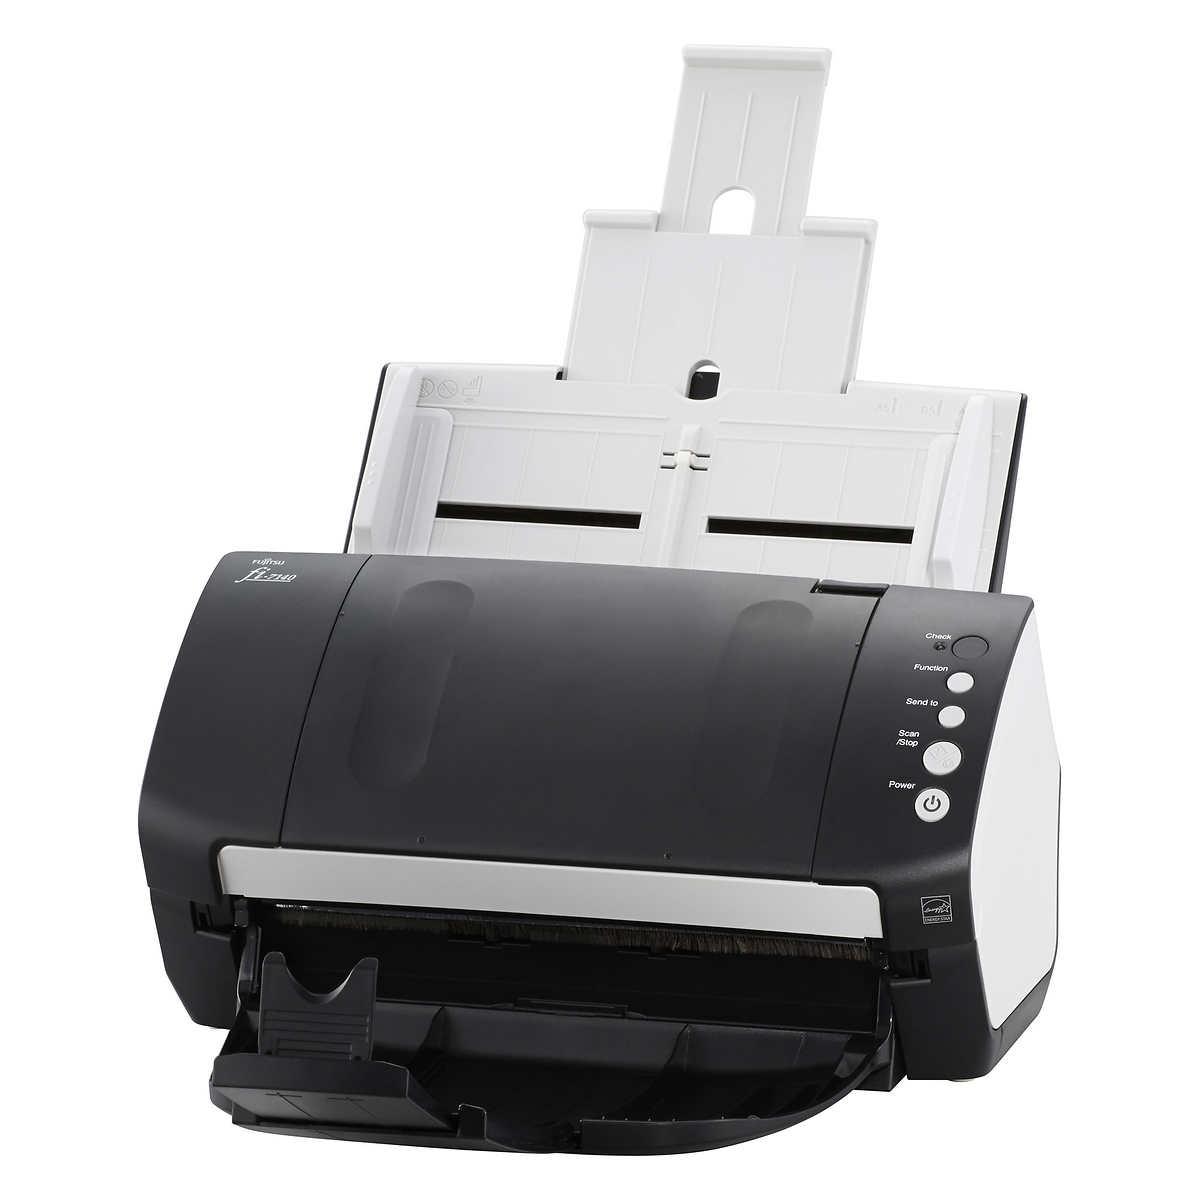 printers u0026 scanners costco